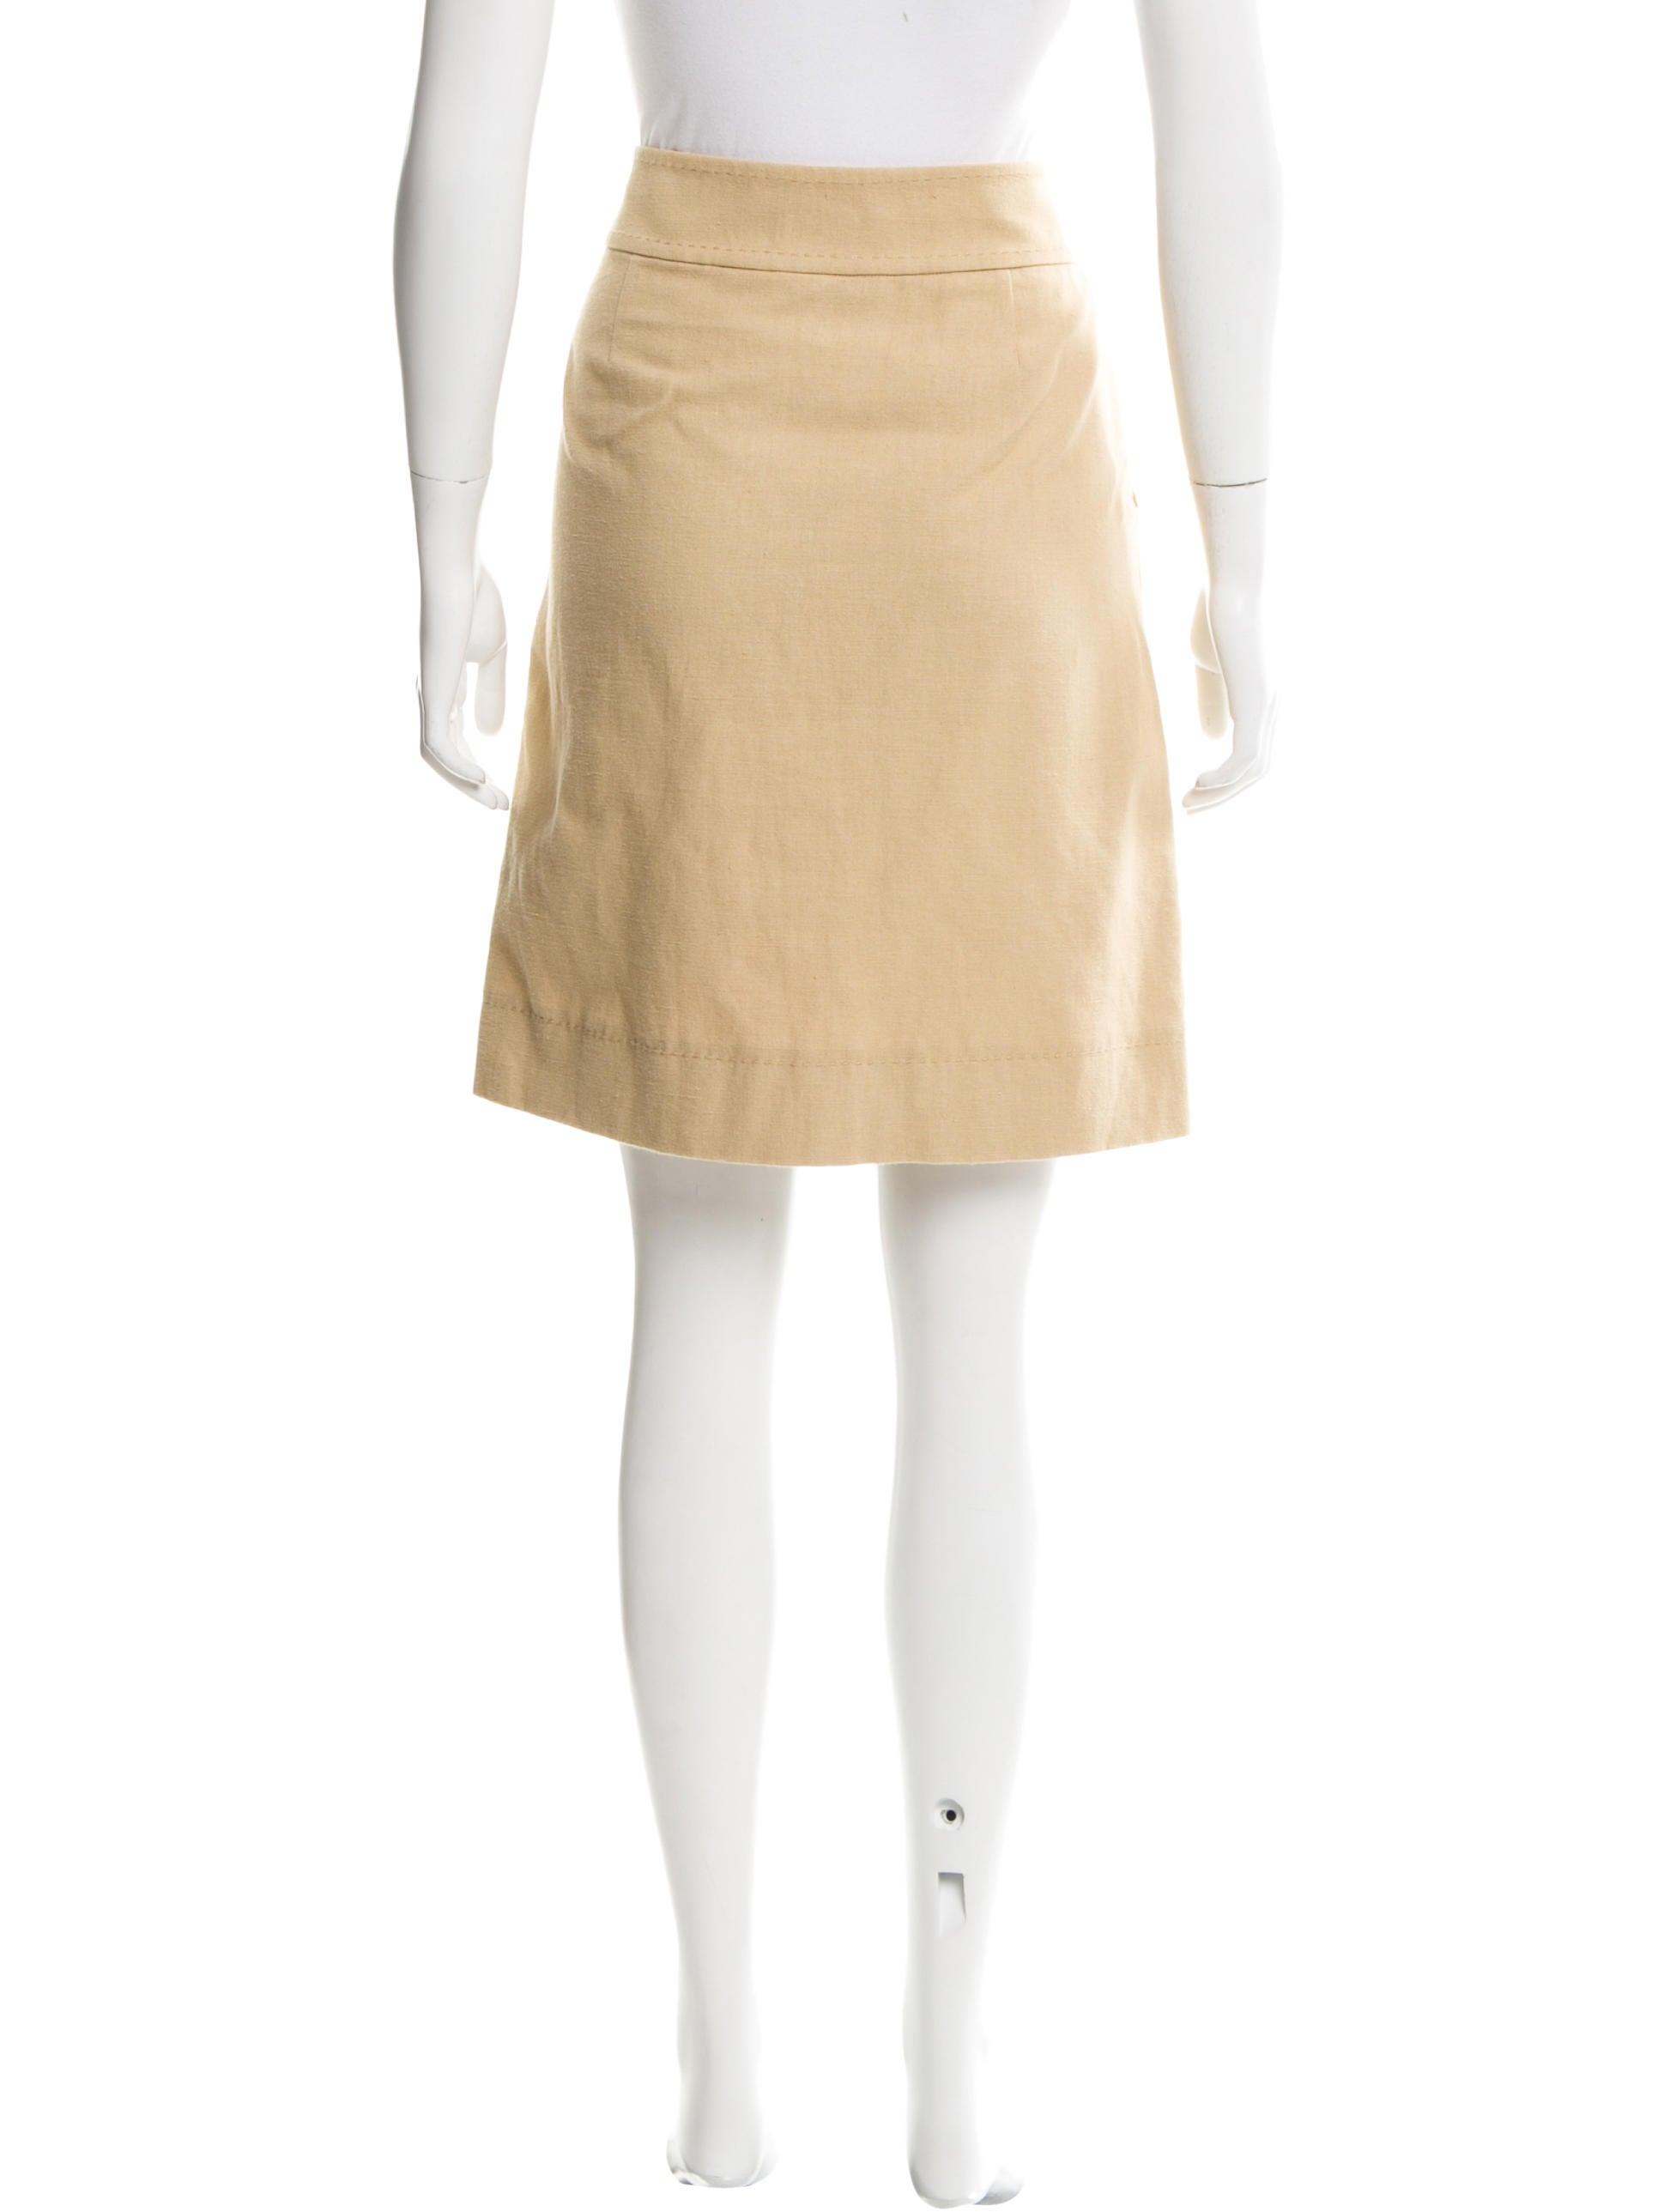 burch knee length linen blend skirt clothing